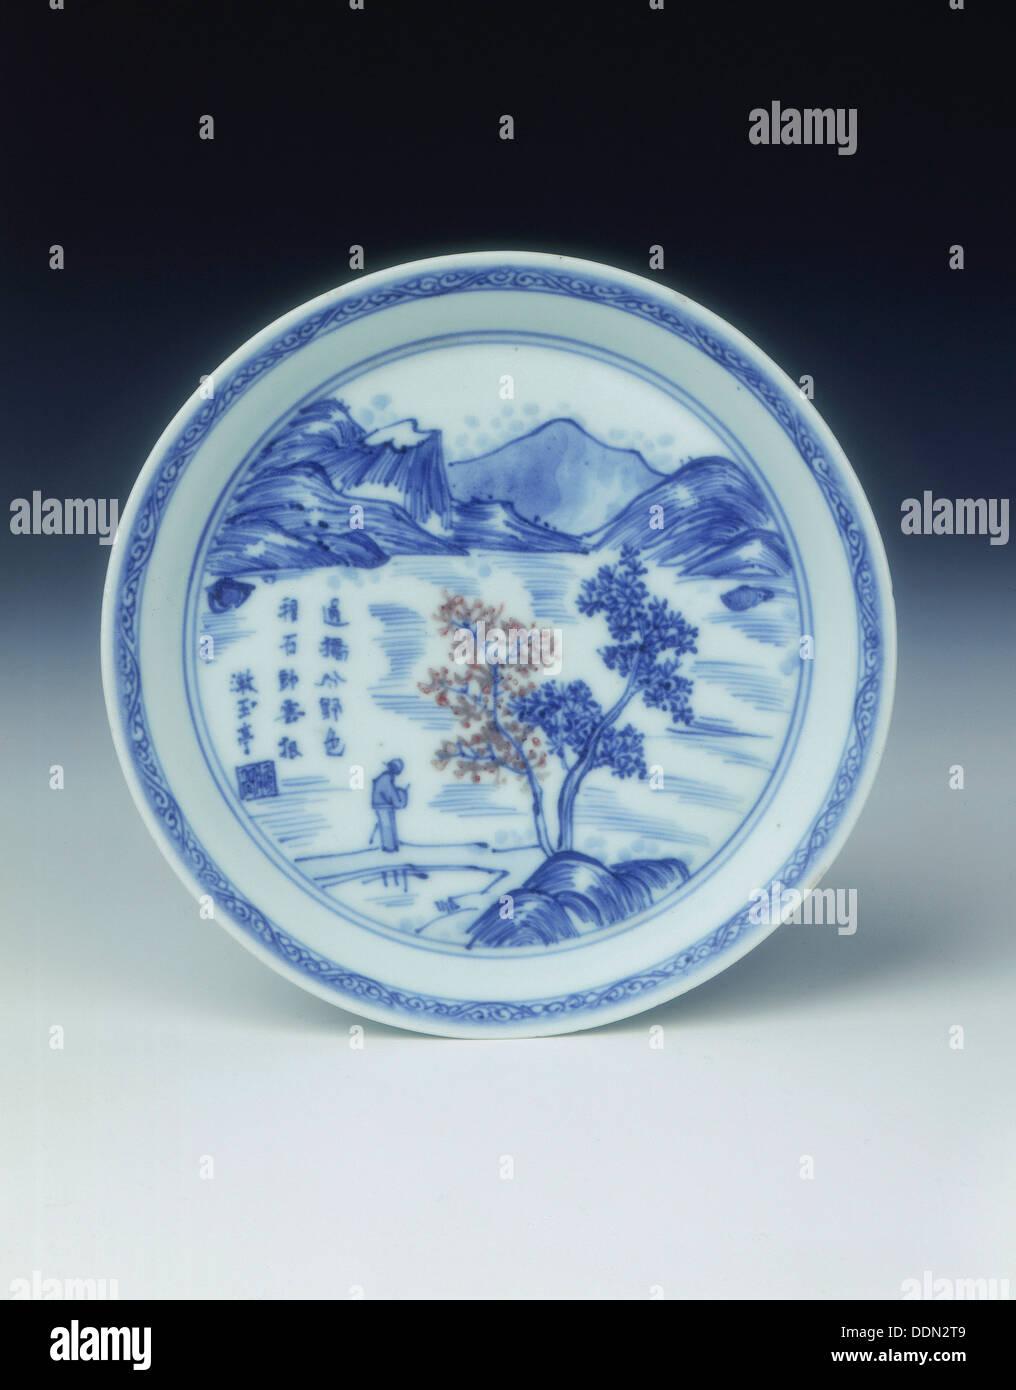 'Master of the Rocks' dish, Kangxi period, Qing dynasty, China, 1671. - Stock Image